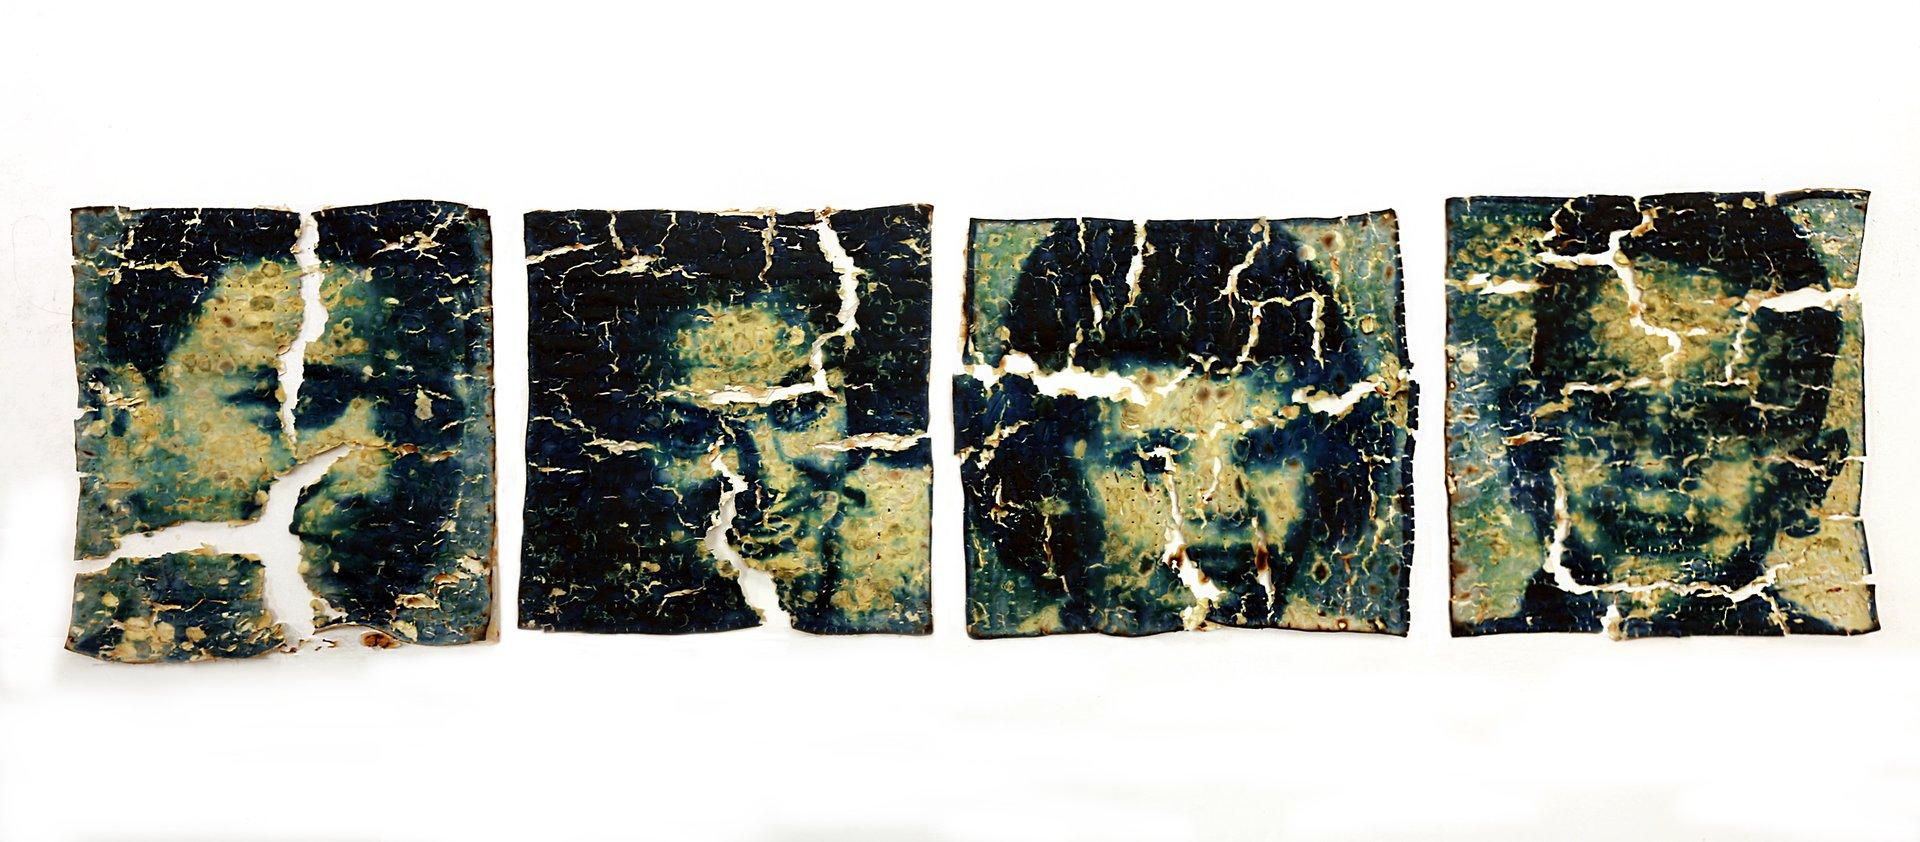 Cyanotype portraits of the Dichter family on matzo crackers.jpg